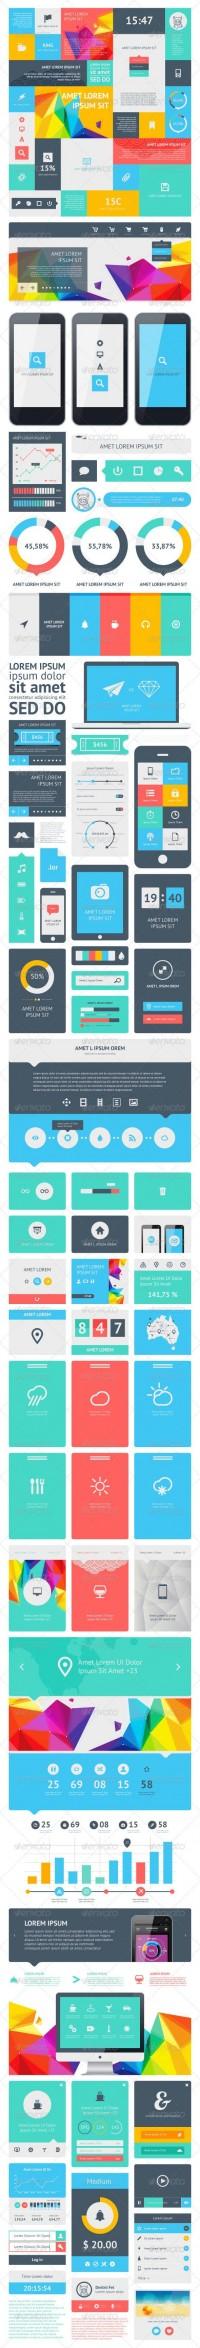 Vectors - UI Set Components Featuring Flat Design | GraphicRiver